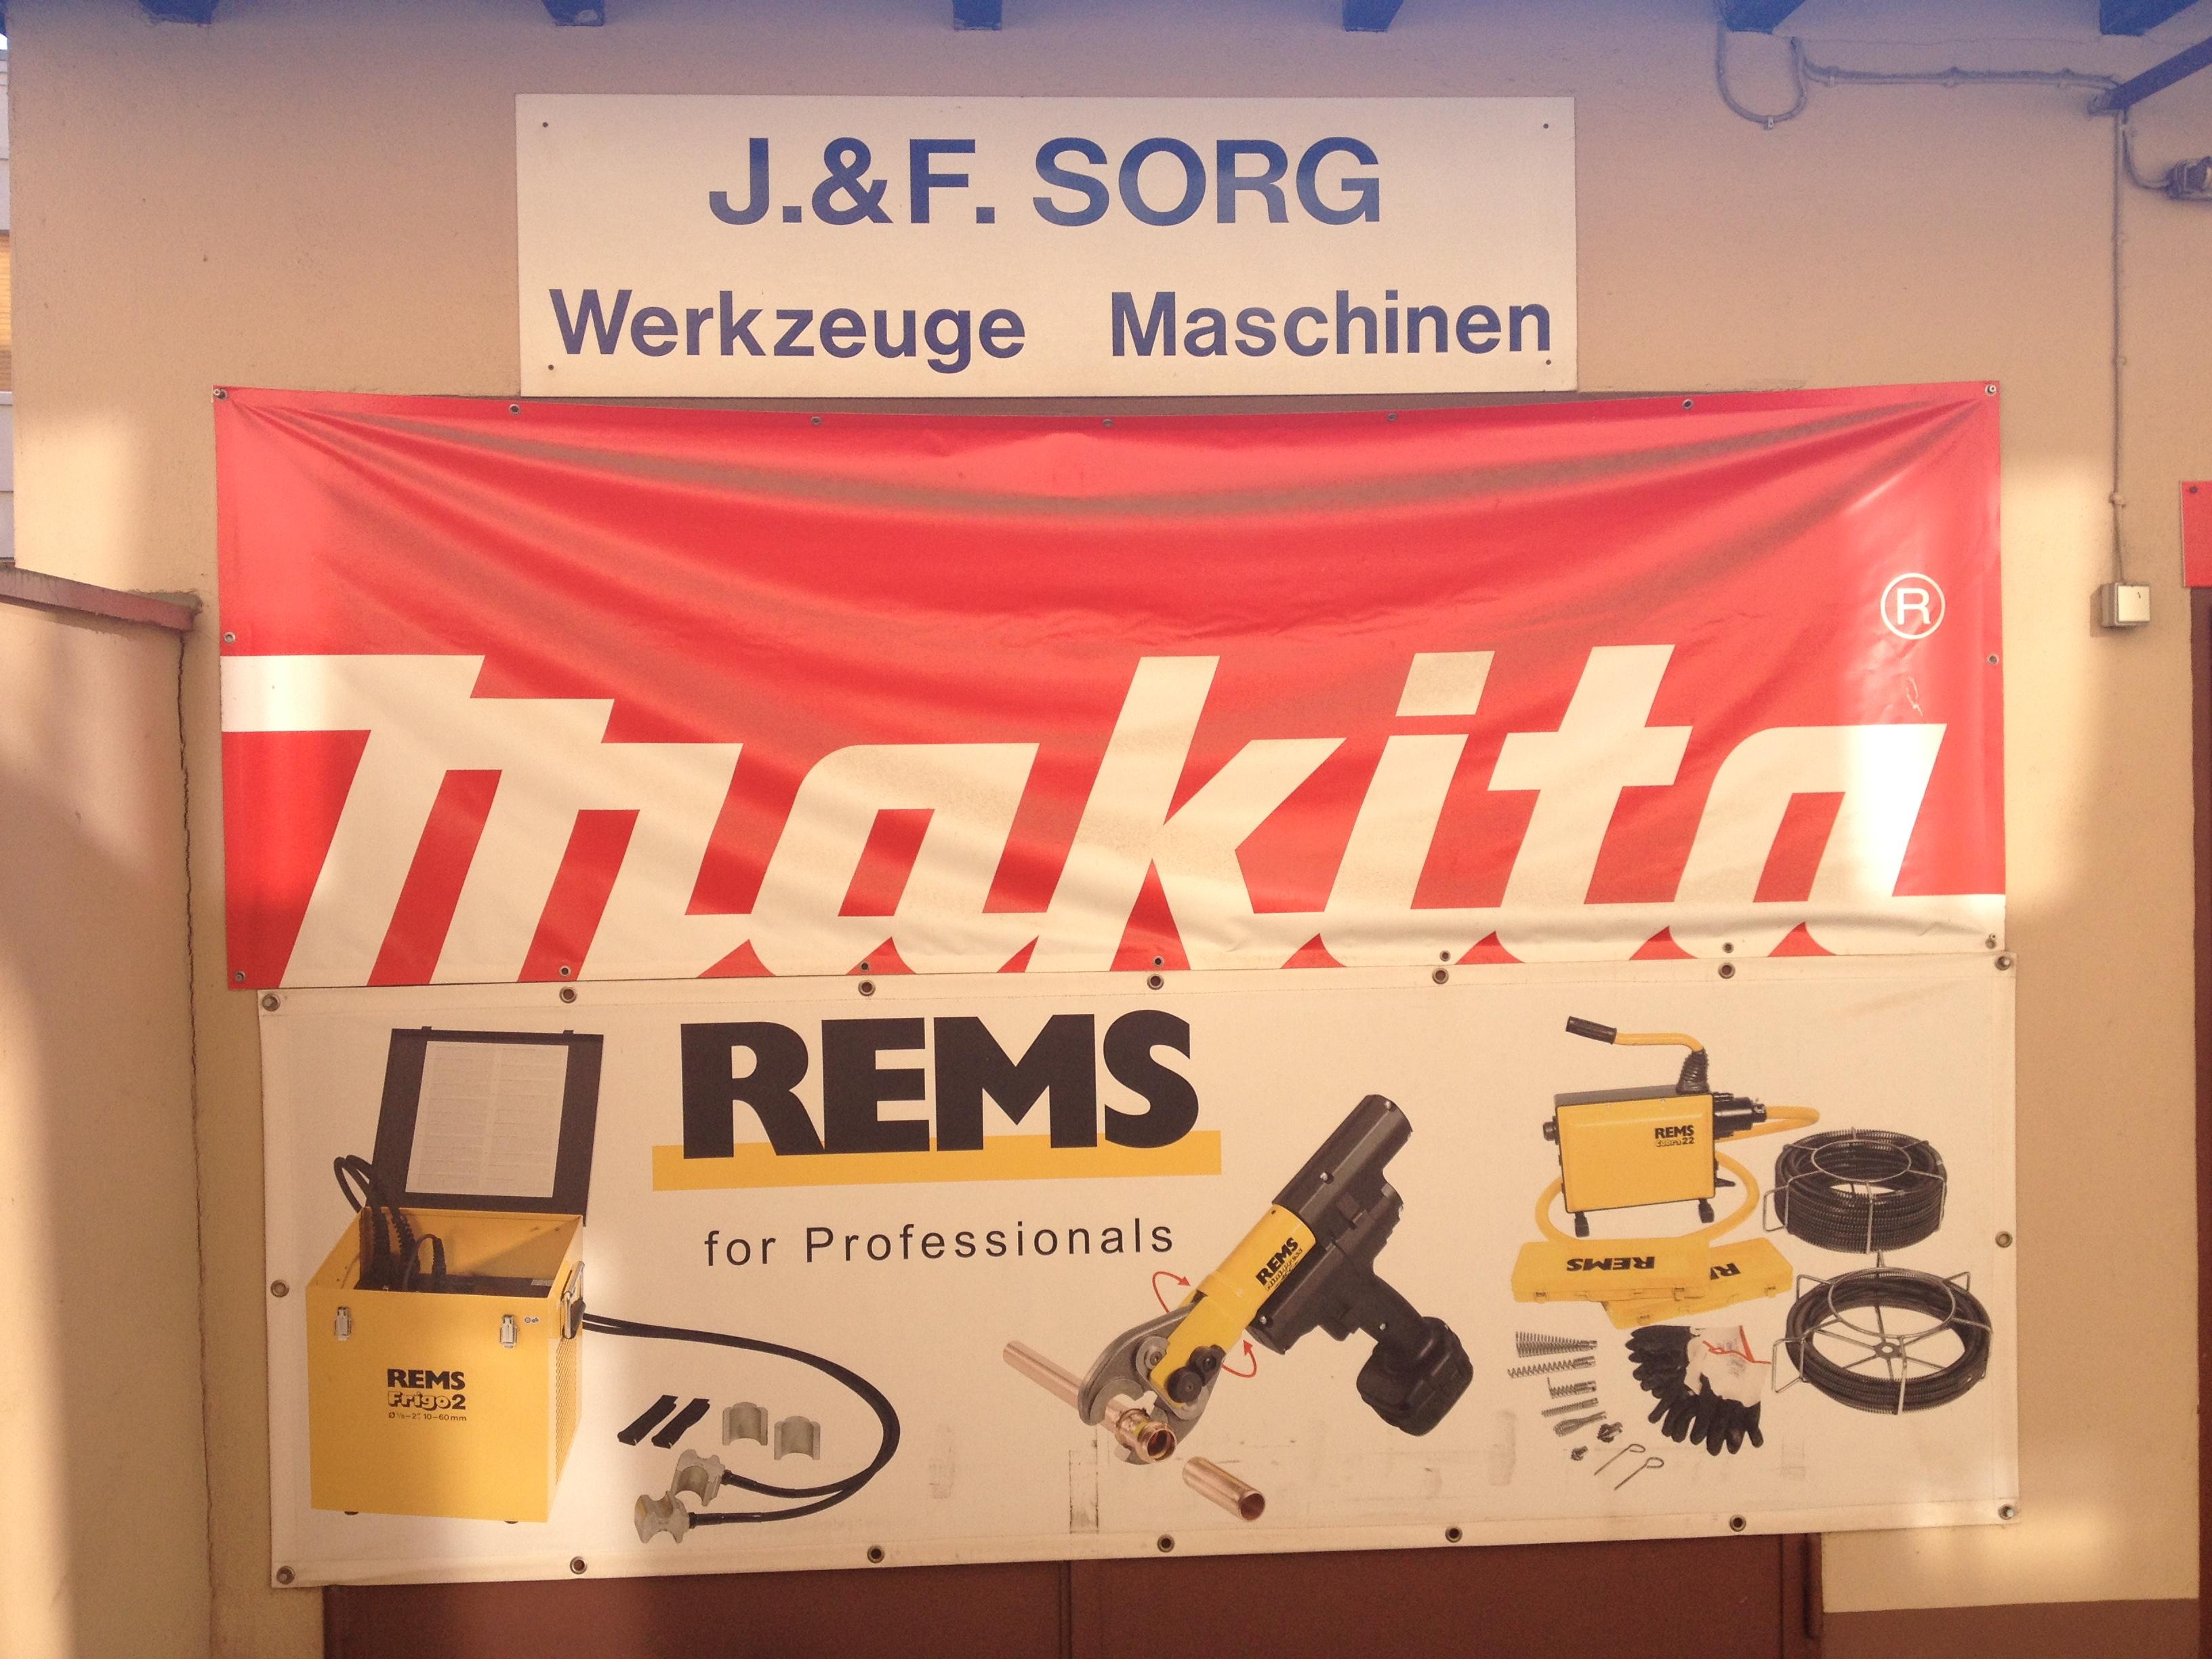 J. & F. Sorg GmbH